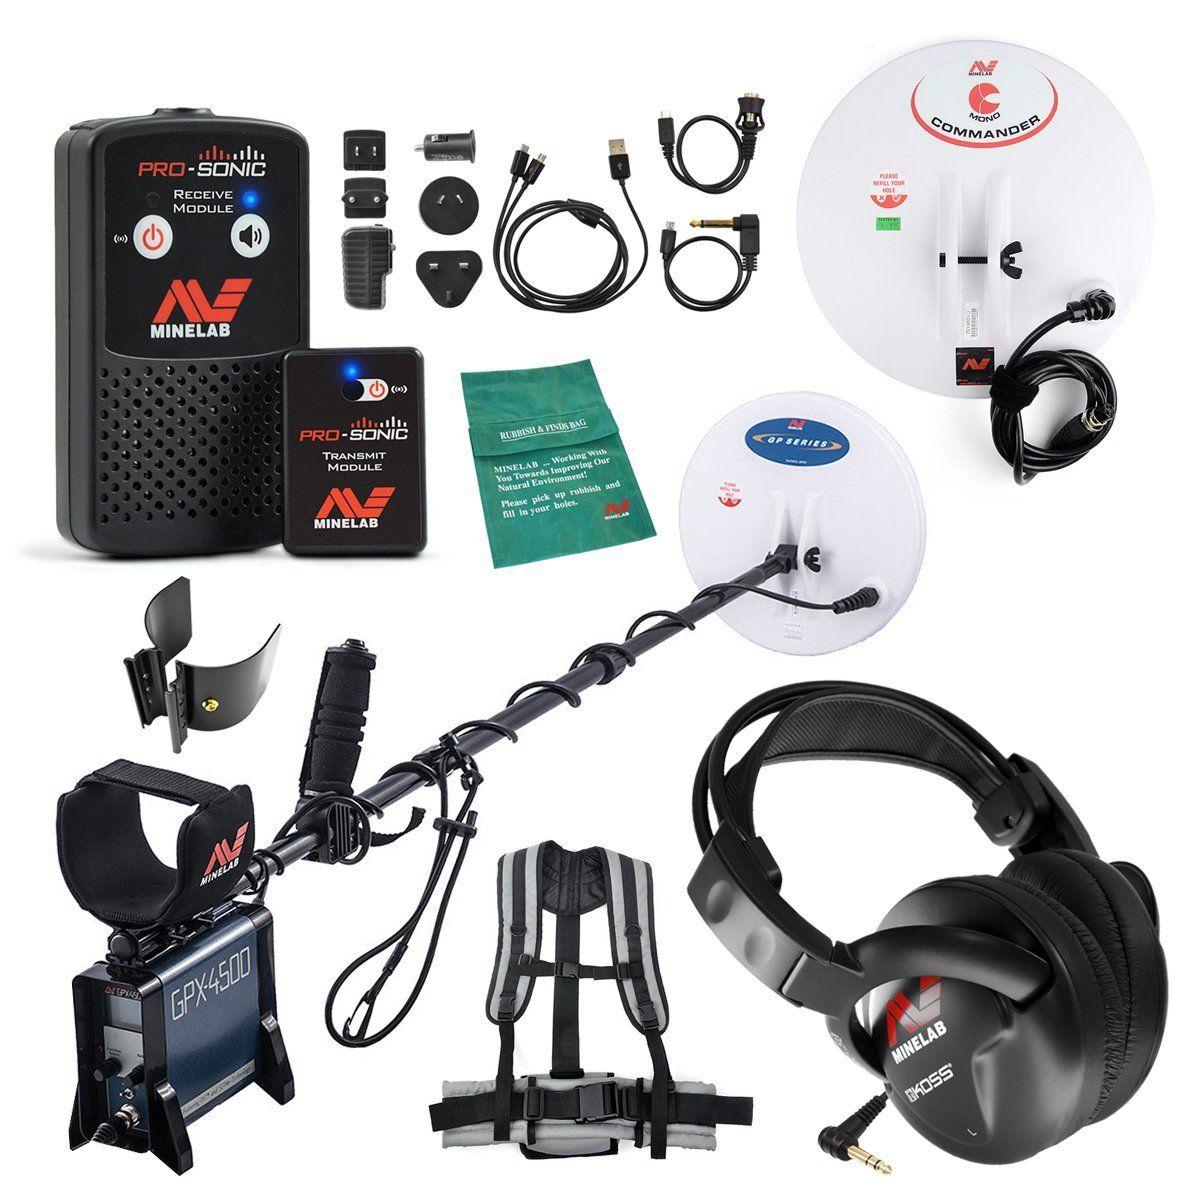 Amazoncom Minelab Gpx 4500 Metal Detector Special With Pro Sonic Module Wireless Audio